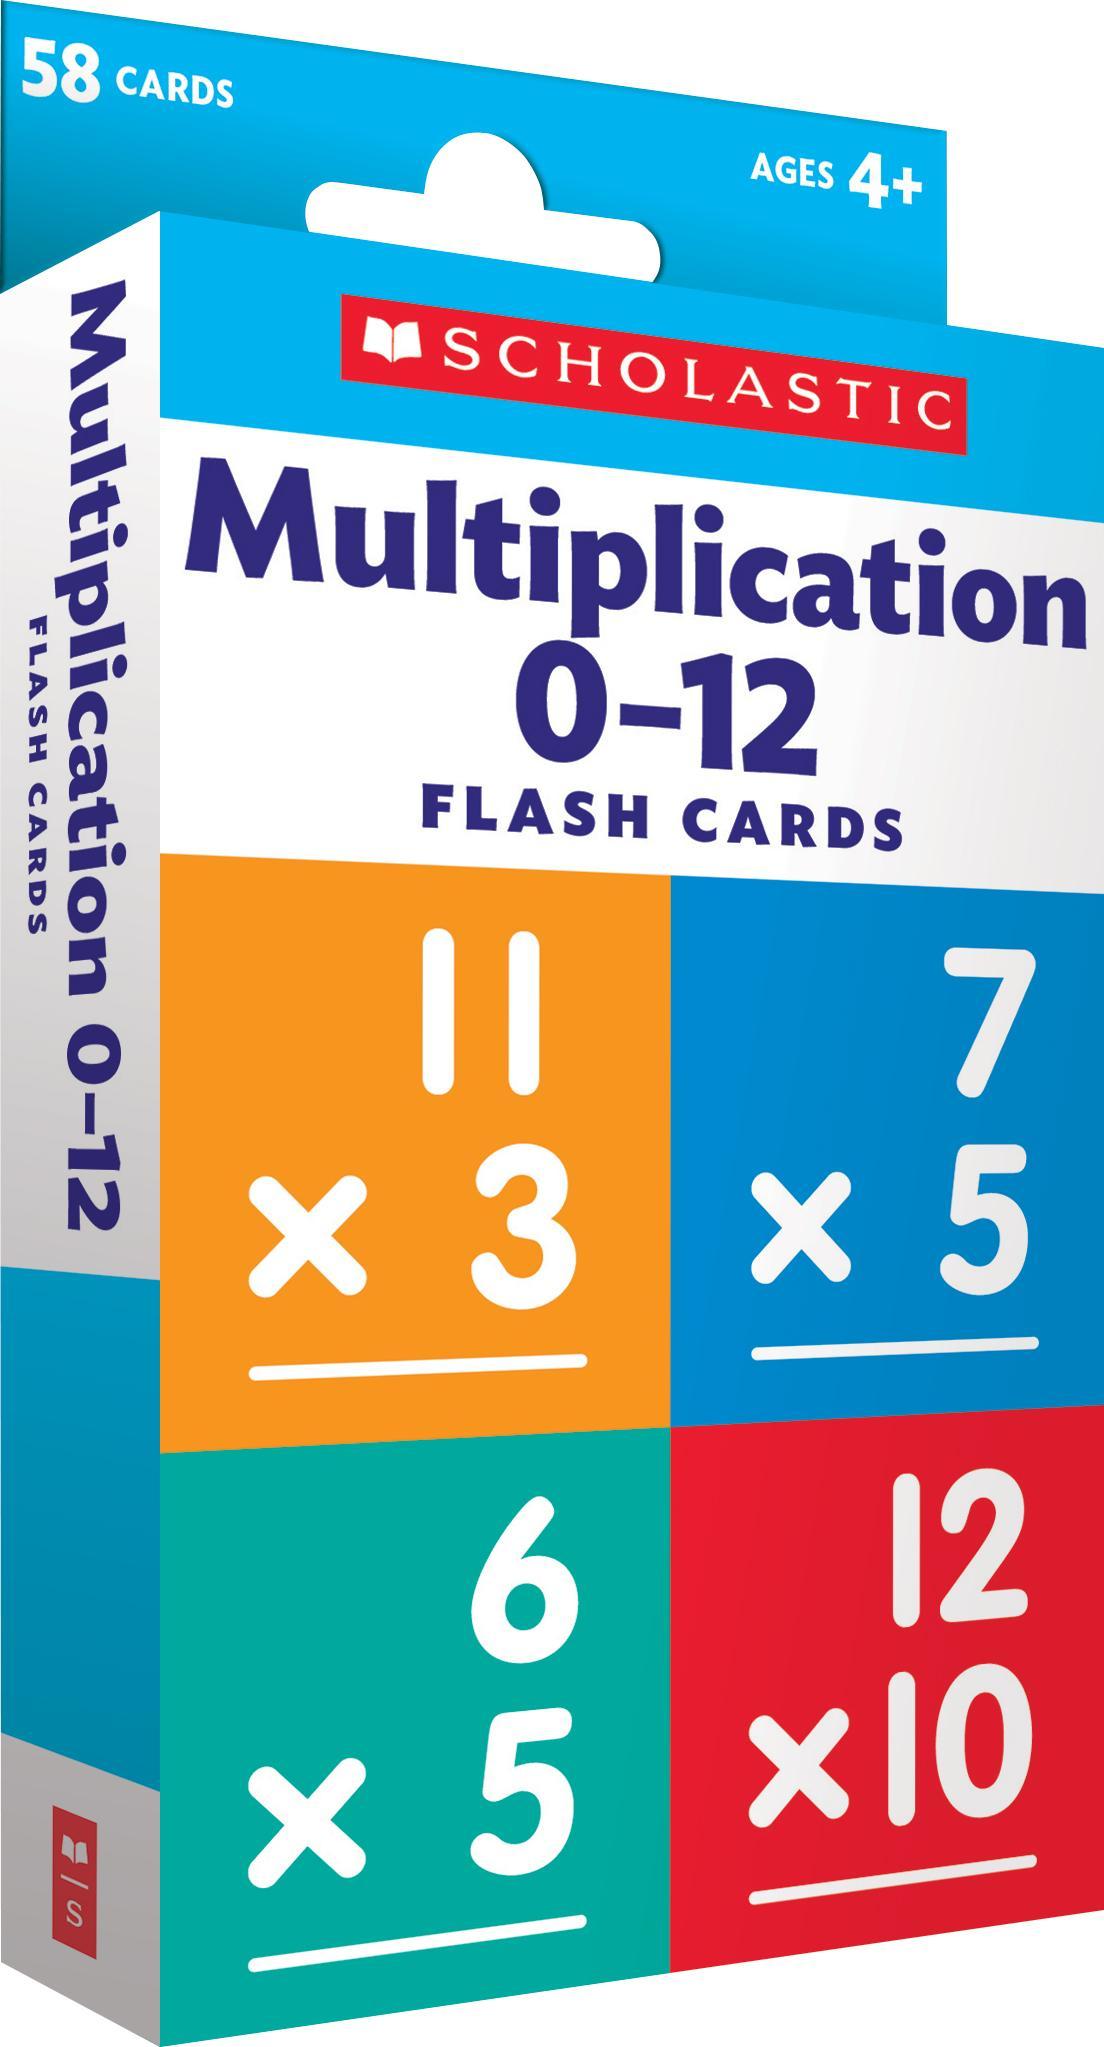 Flash Cards: Flash Cards: Multiplication 0 - 12 (Other) - Walmart